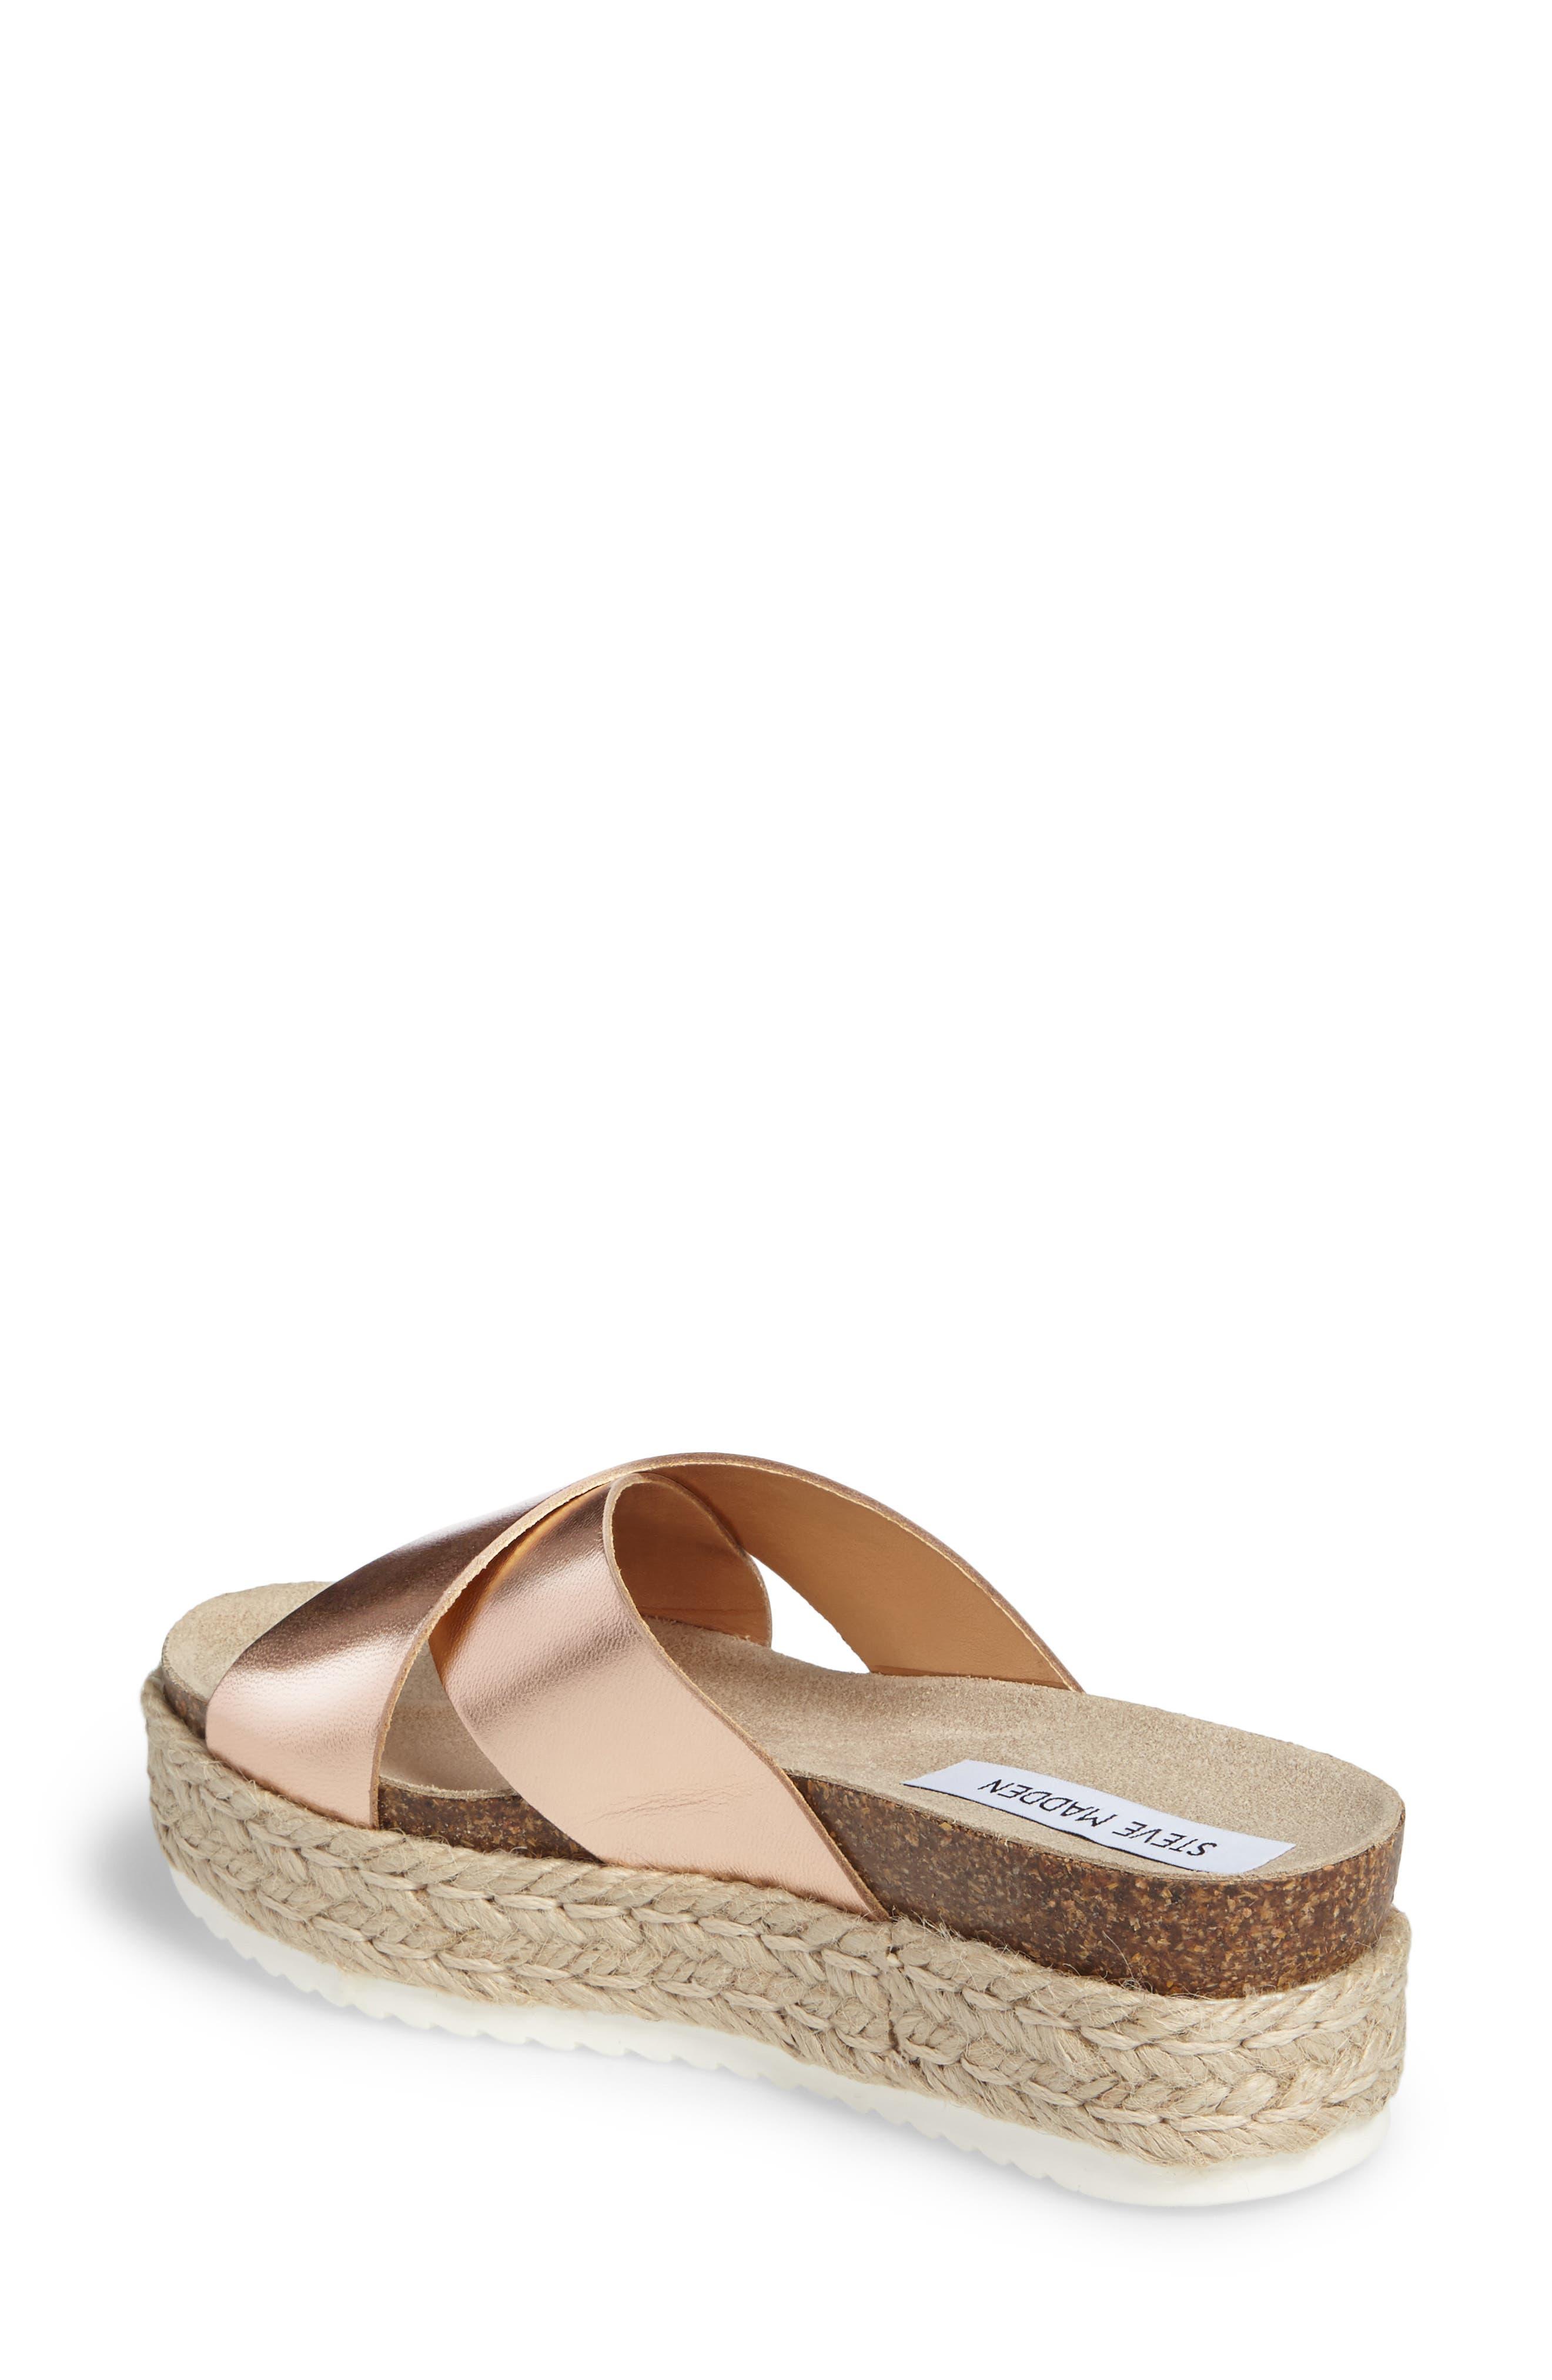 Alternate Image 2  - Steve Madden 'Arran' Espadrille Platform Sandal (Women)